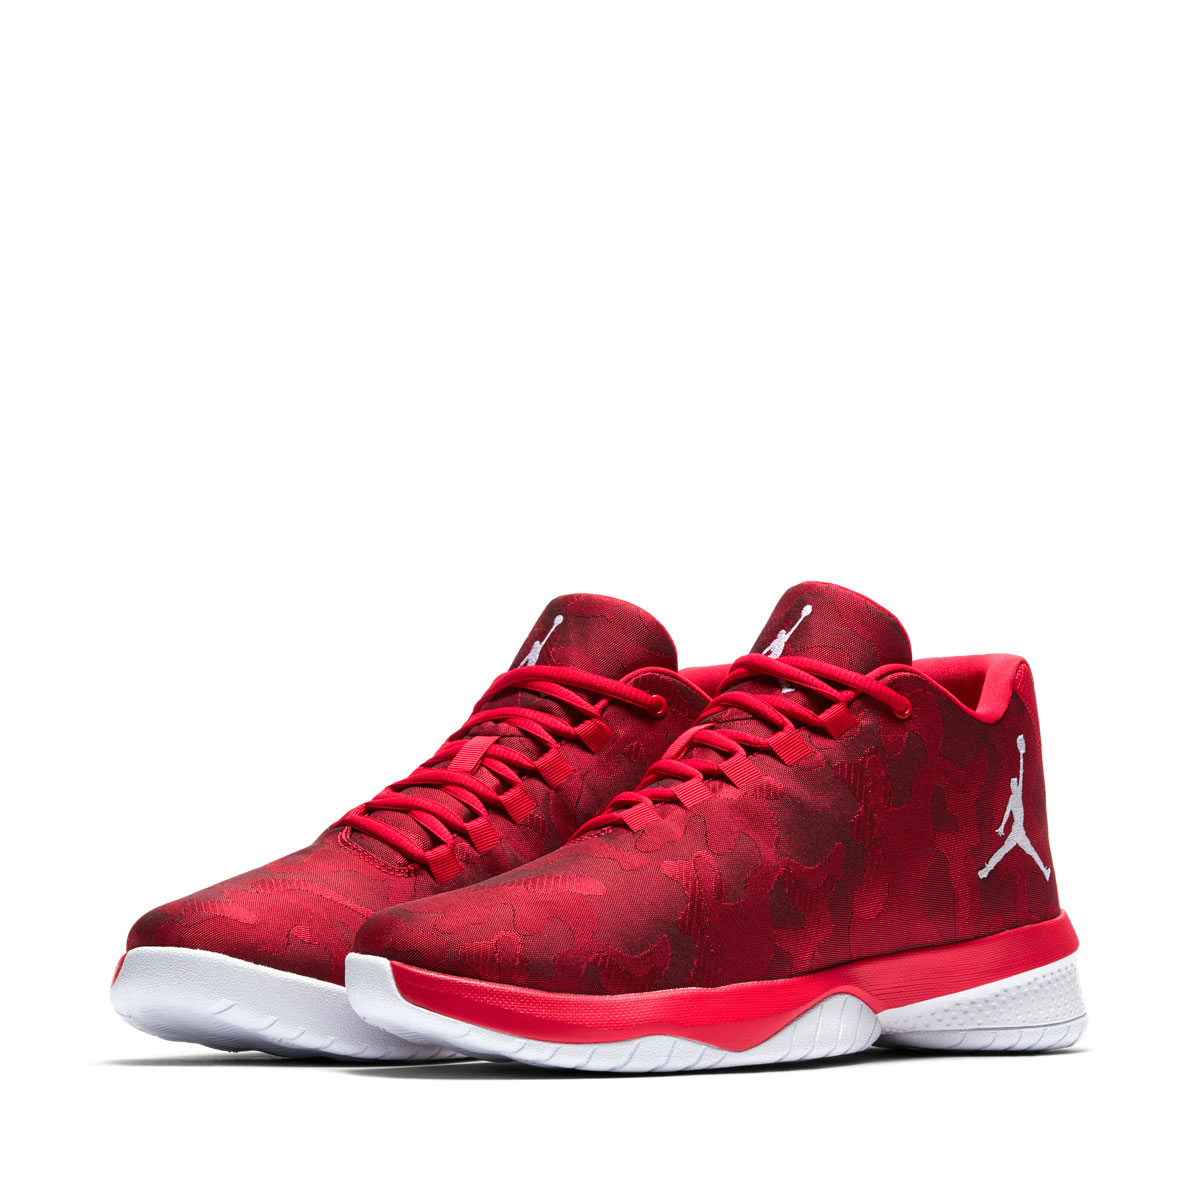 atmos pink  NIKE JORDAN B. FLY (Nike Jordan B.FLY) (UNIVERSITY RED ... c19f0593dcd